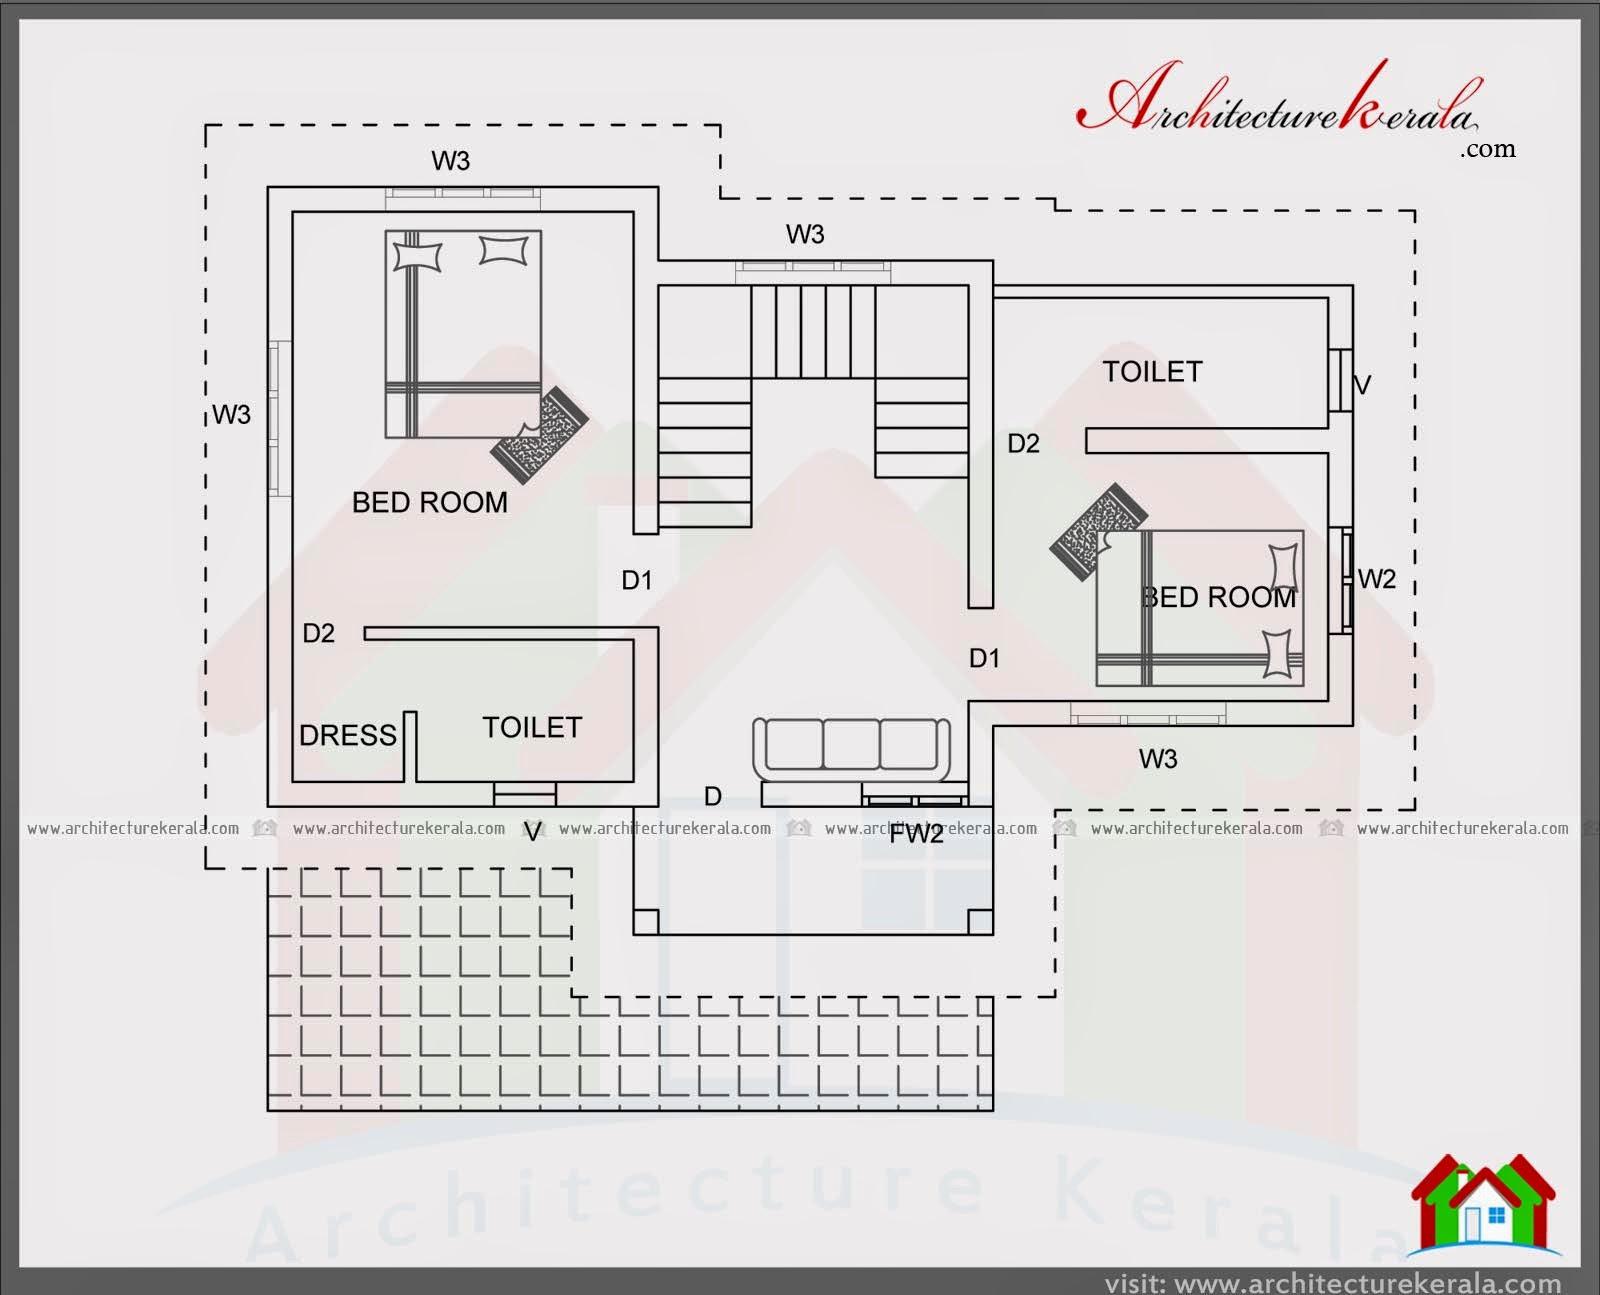 Home Design 800 Sq Feet - HomeRiview on 1200 square feet home, 1200 square feet 3 bedroom house plans, two bedroom 2 bath house plans,